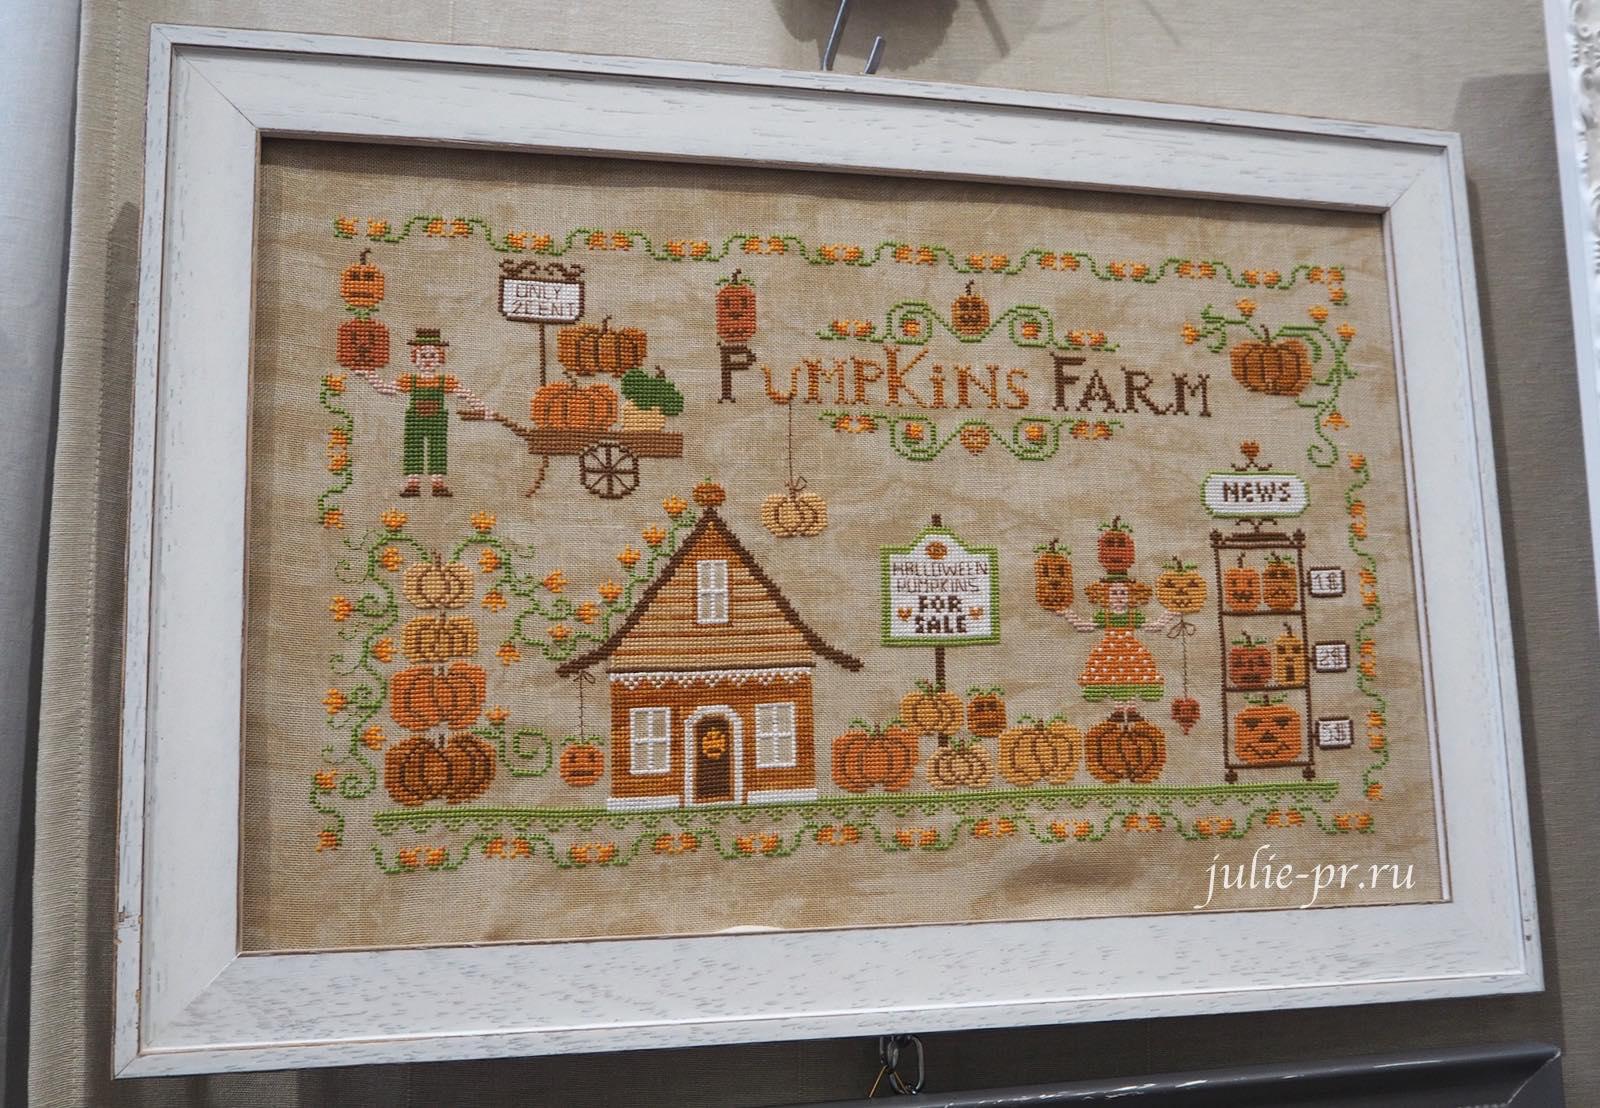 Cuore e Batticuore, Pumpkins Farm, Ферма тыкв, вышивка крестом